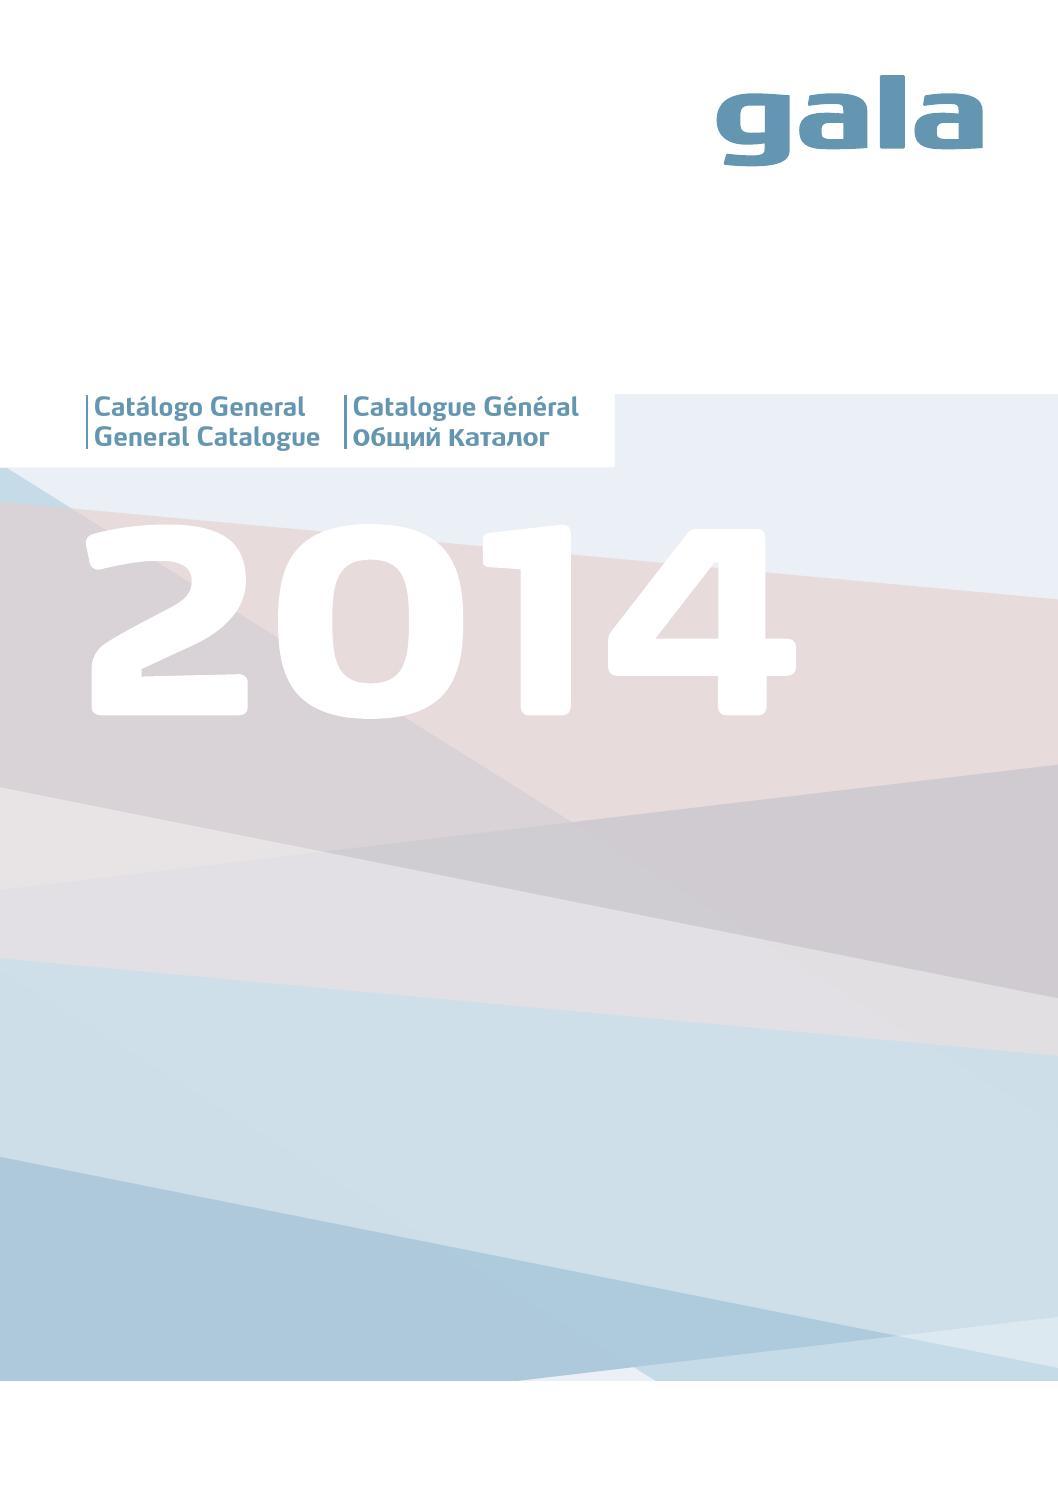 Gala cgi sanitarios 2014 baja ca by carvalho afonso lda for Sanitarios gala catalogo